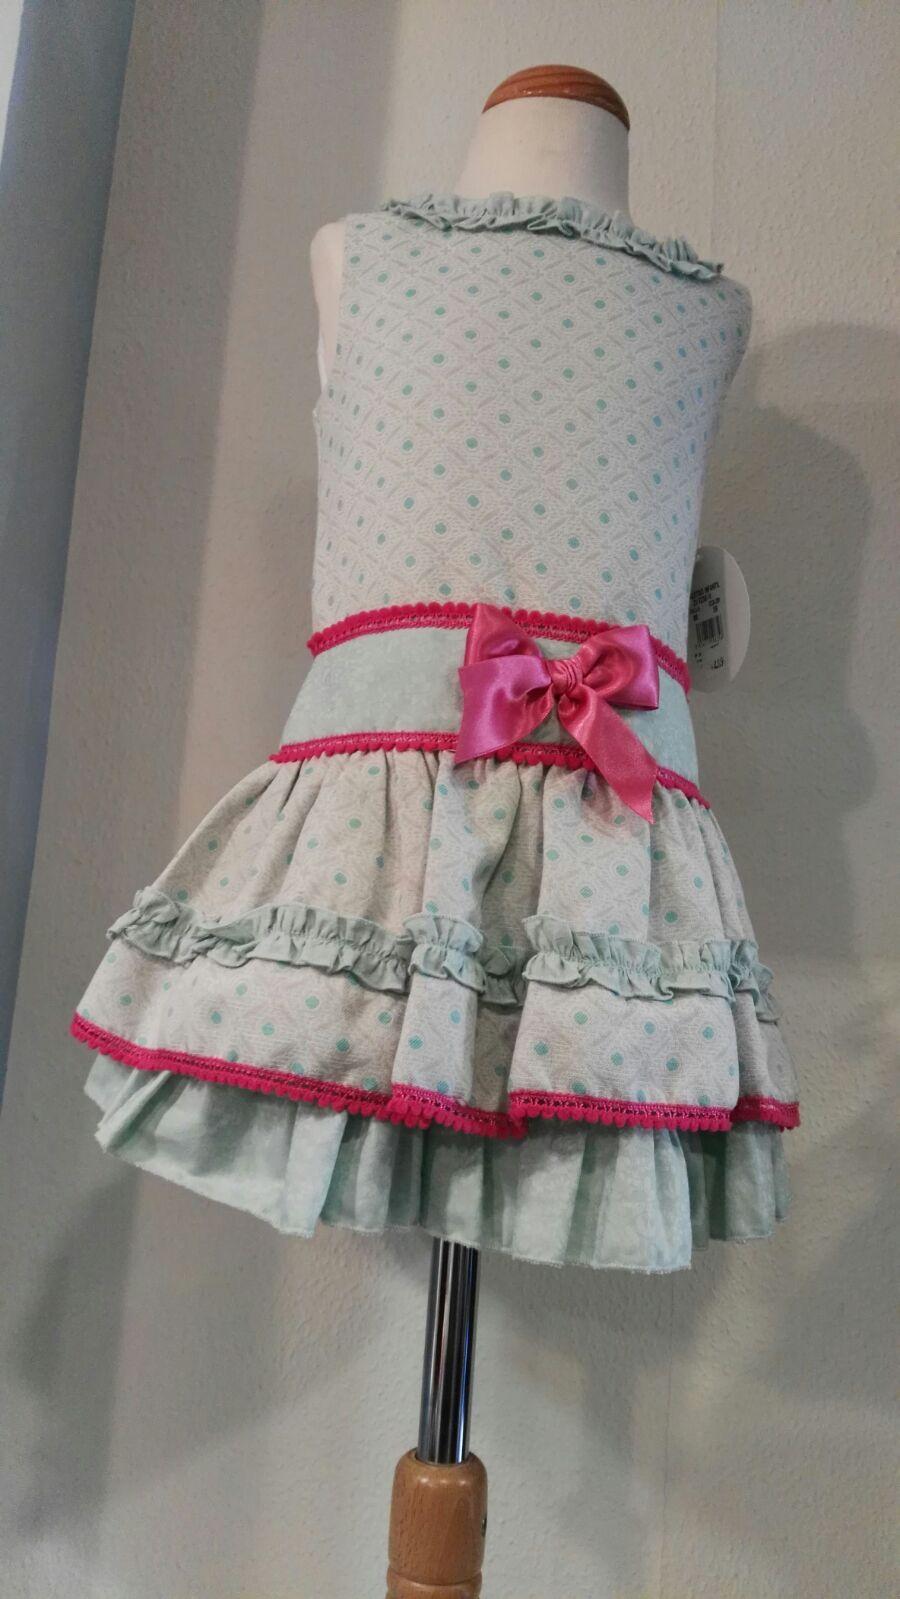 moda infantil villaviciosa asturias